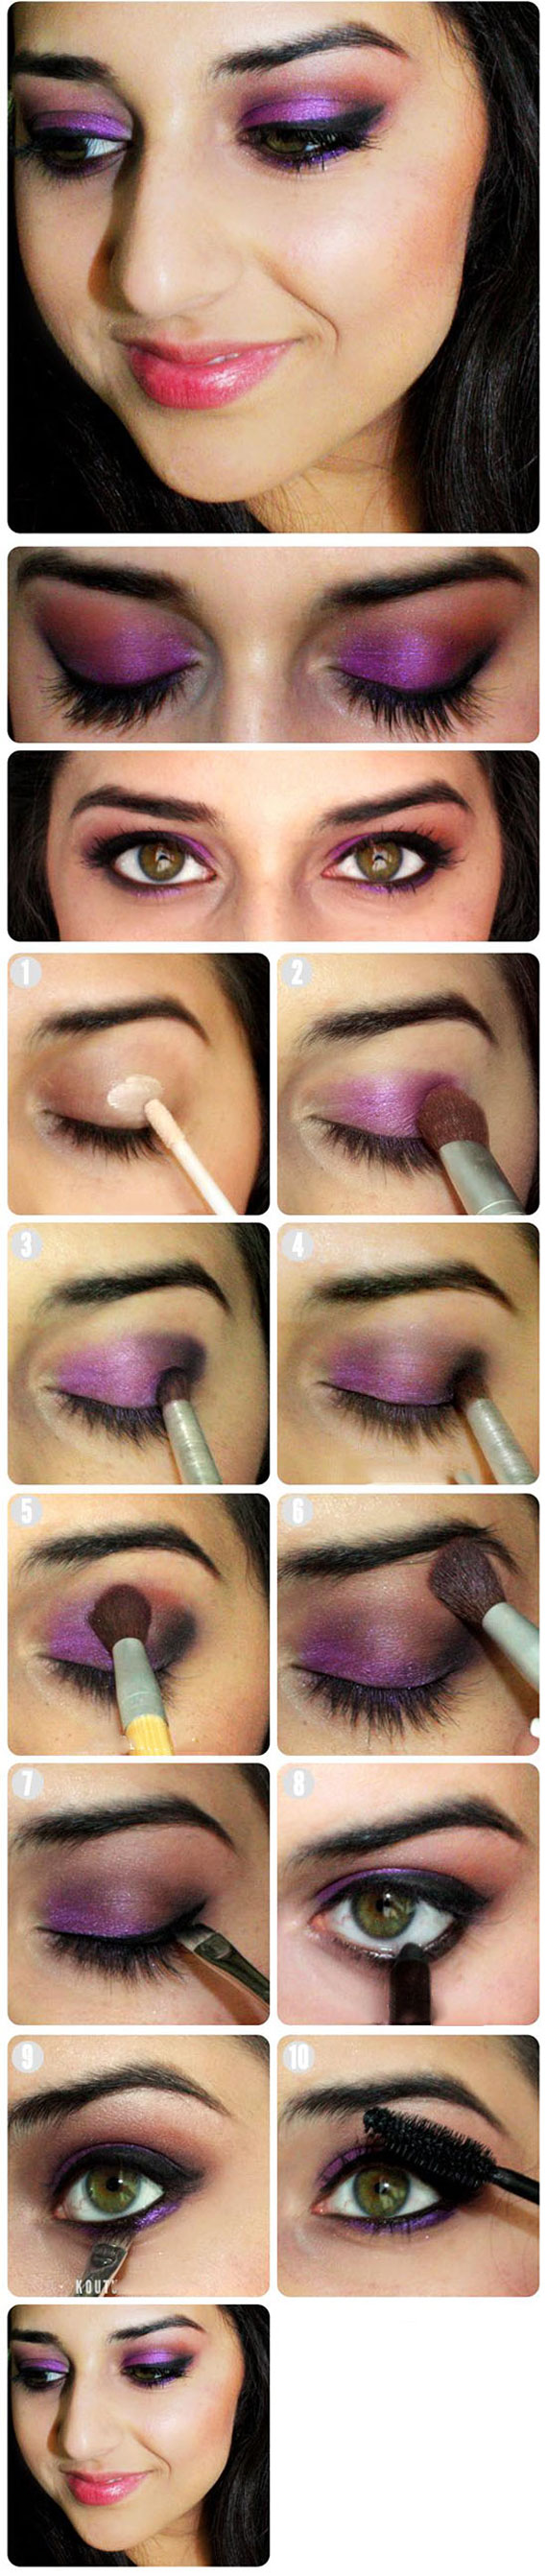 Eye-makeup-tutorial-(5)